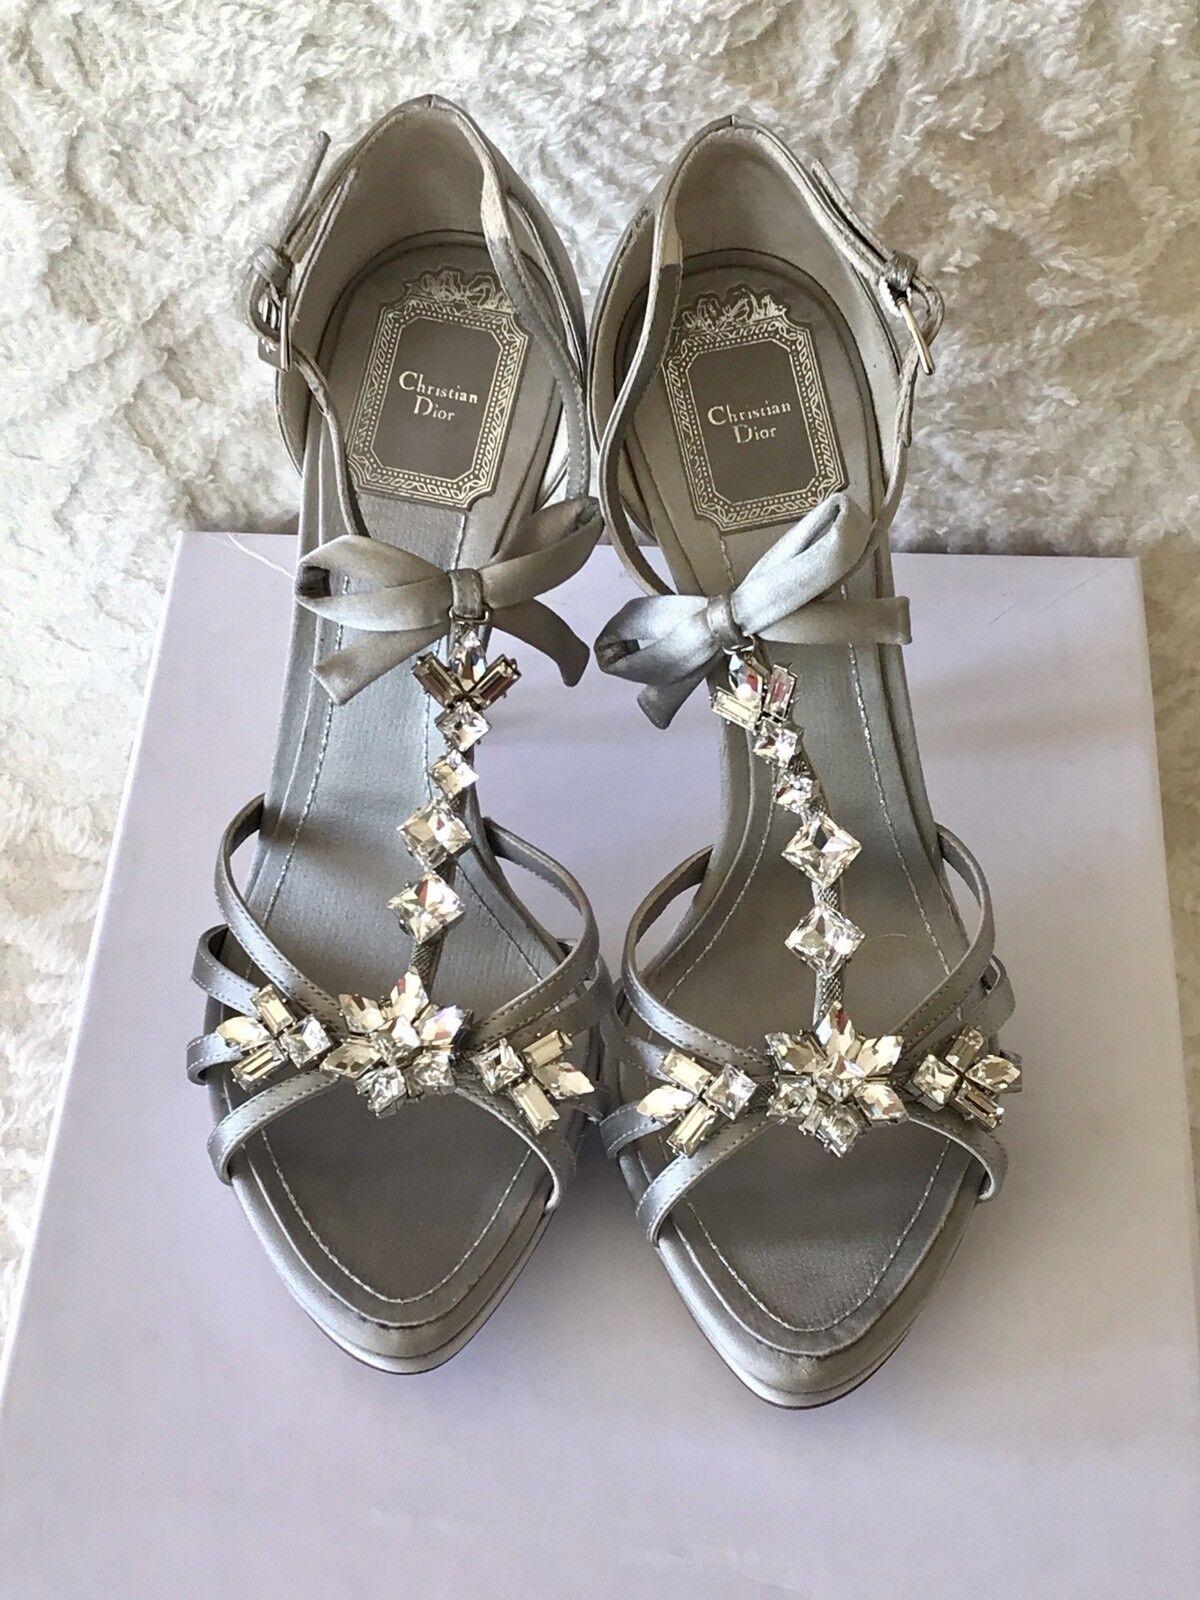 Christian  Dior Nuovo Raro Grigio Satin Cristallo Sandal 11.5 cm Sz 38.5  8.5 - 950  ultimi stili